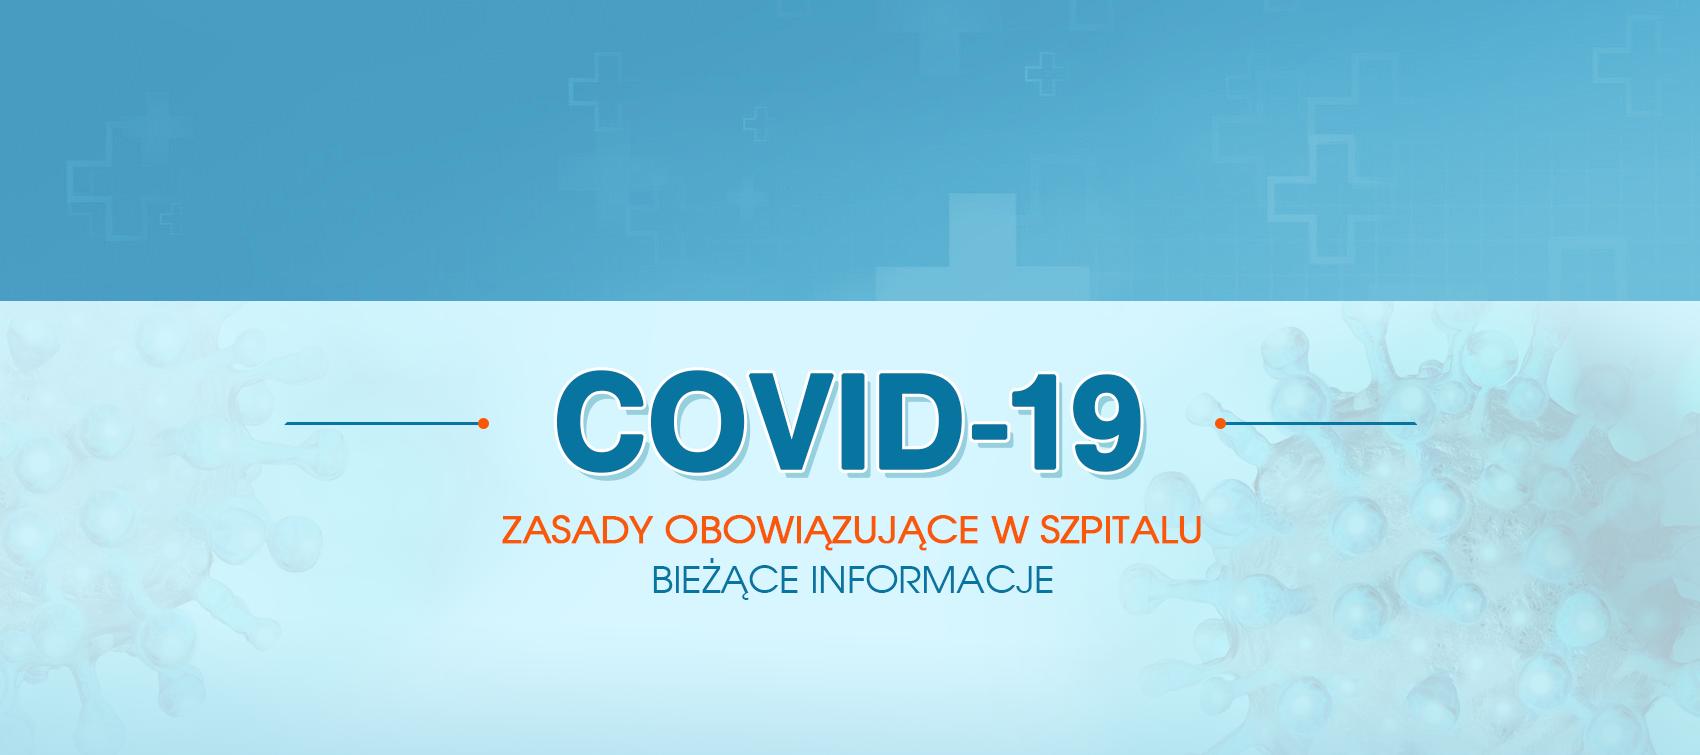 COVID-19 baner